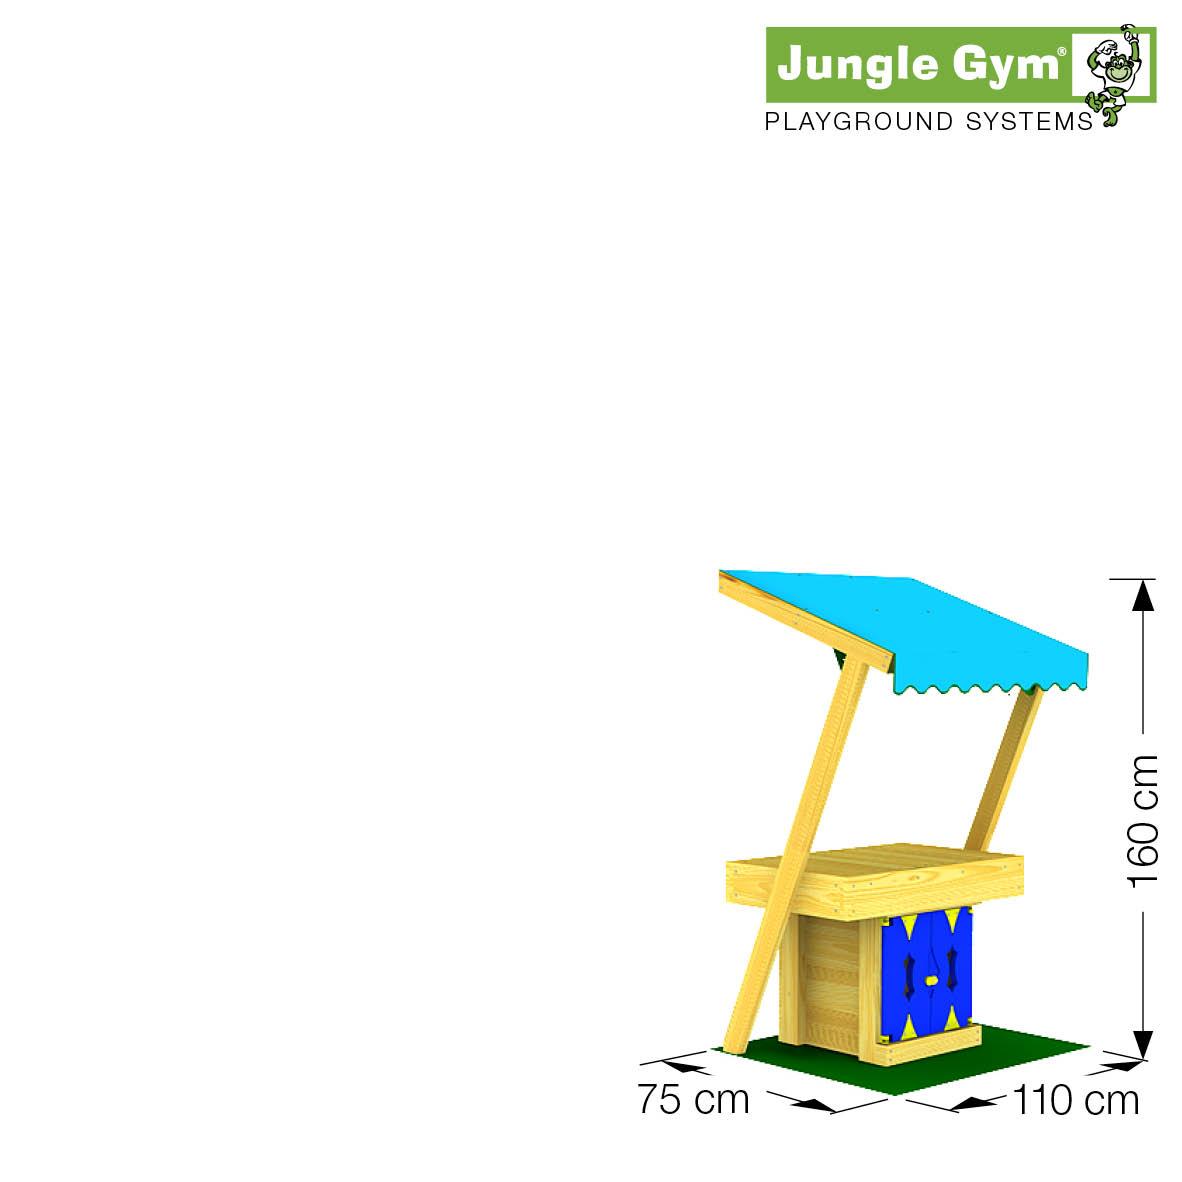 850_261_1581_Mini_Market_Module_10x10